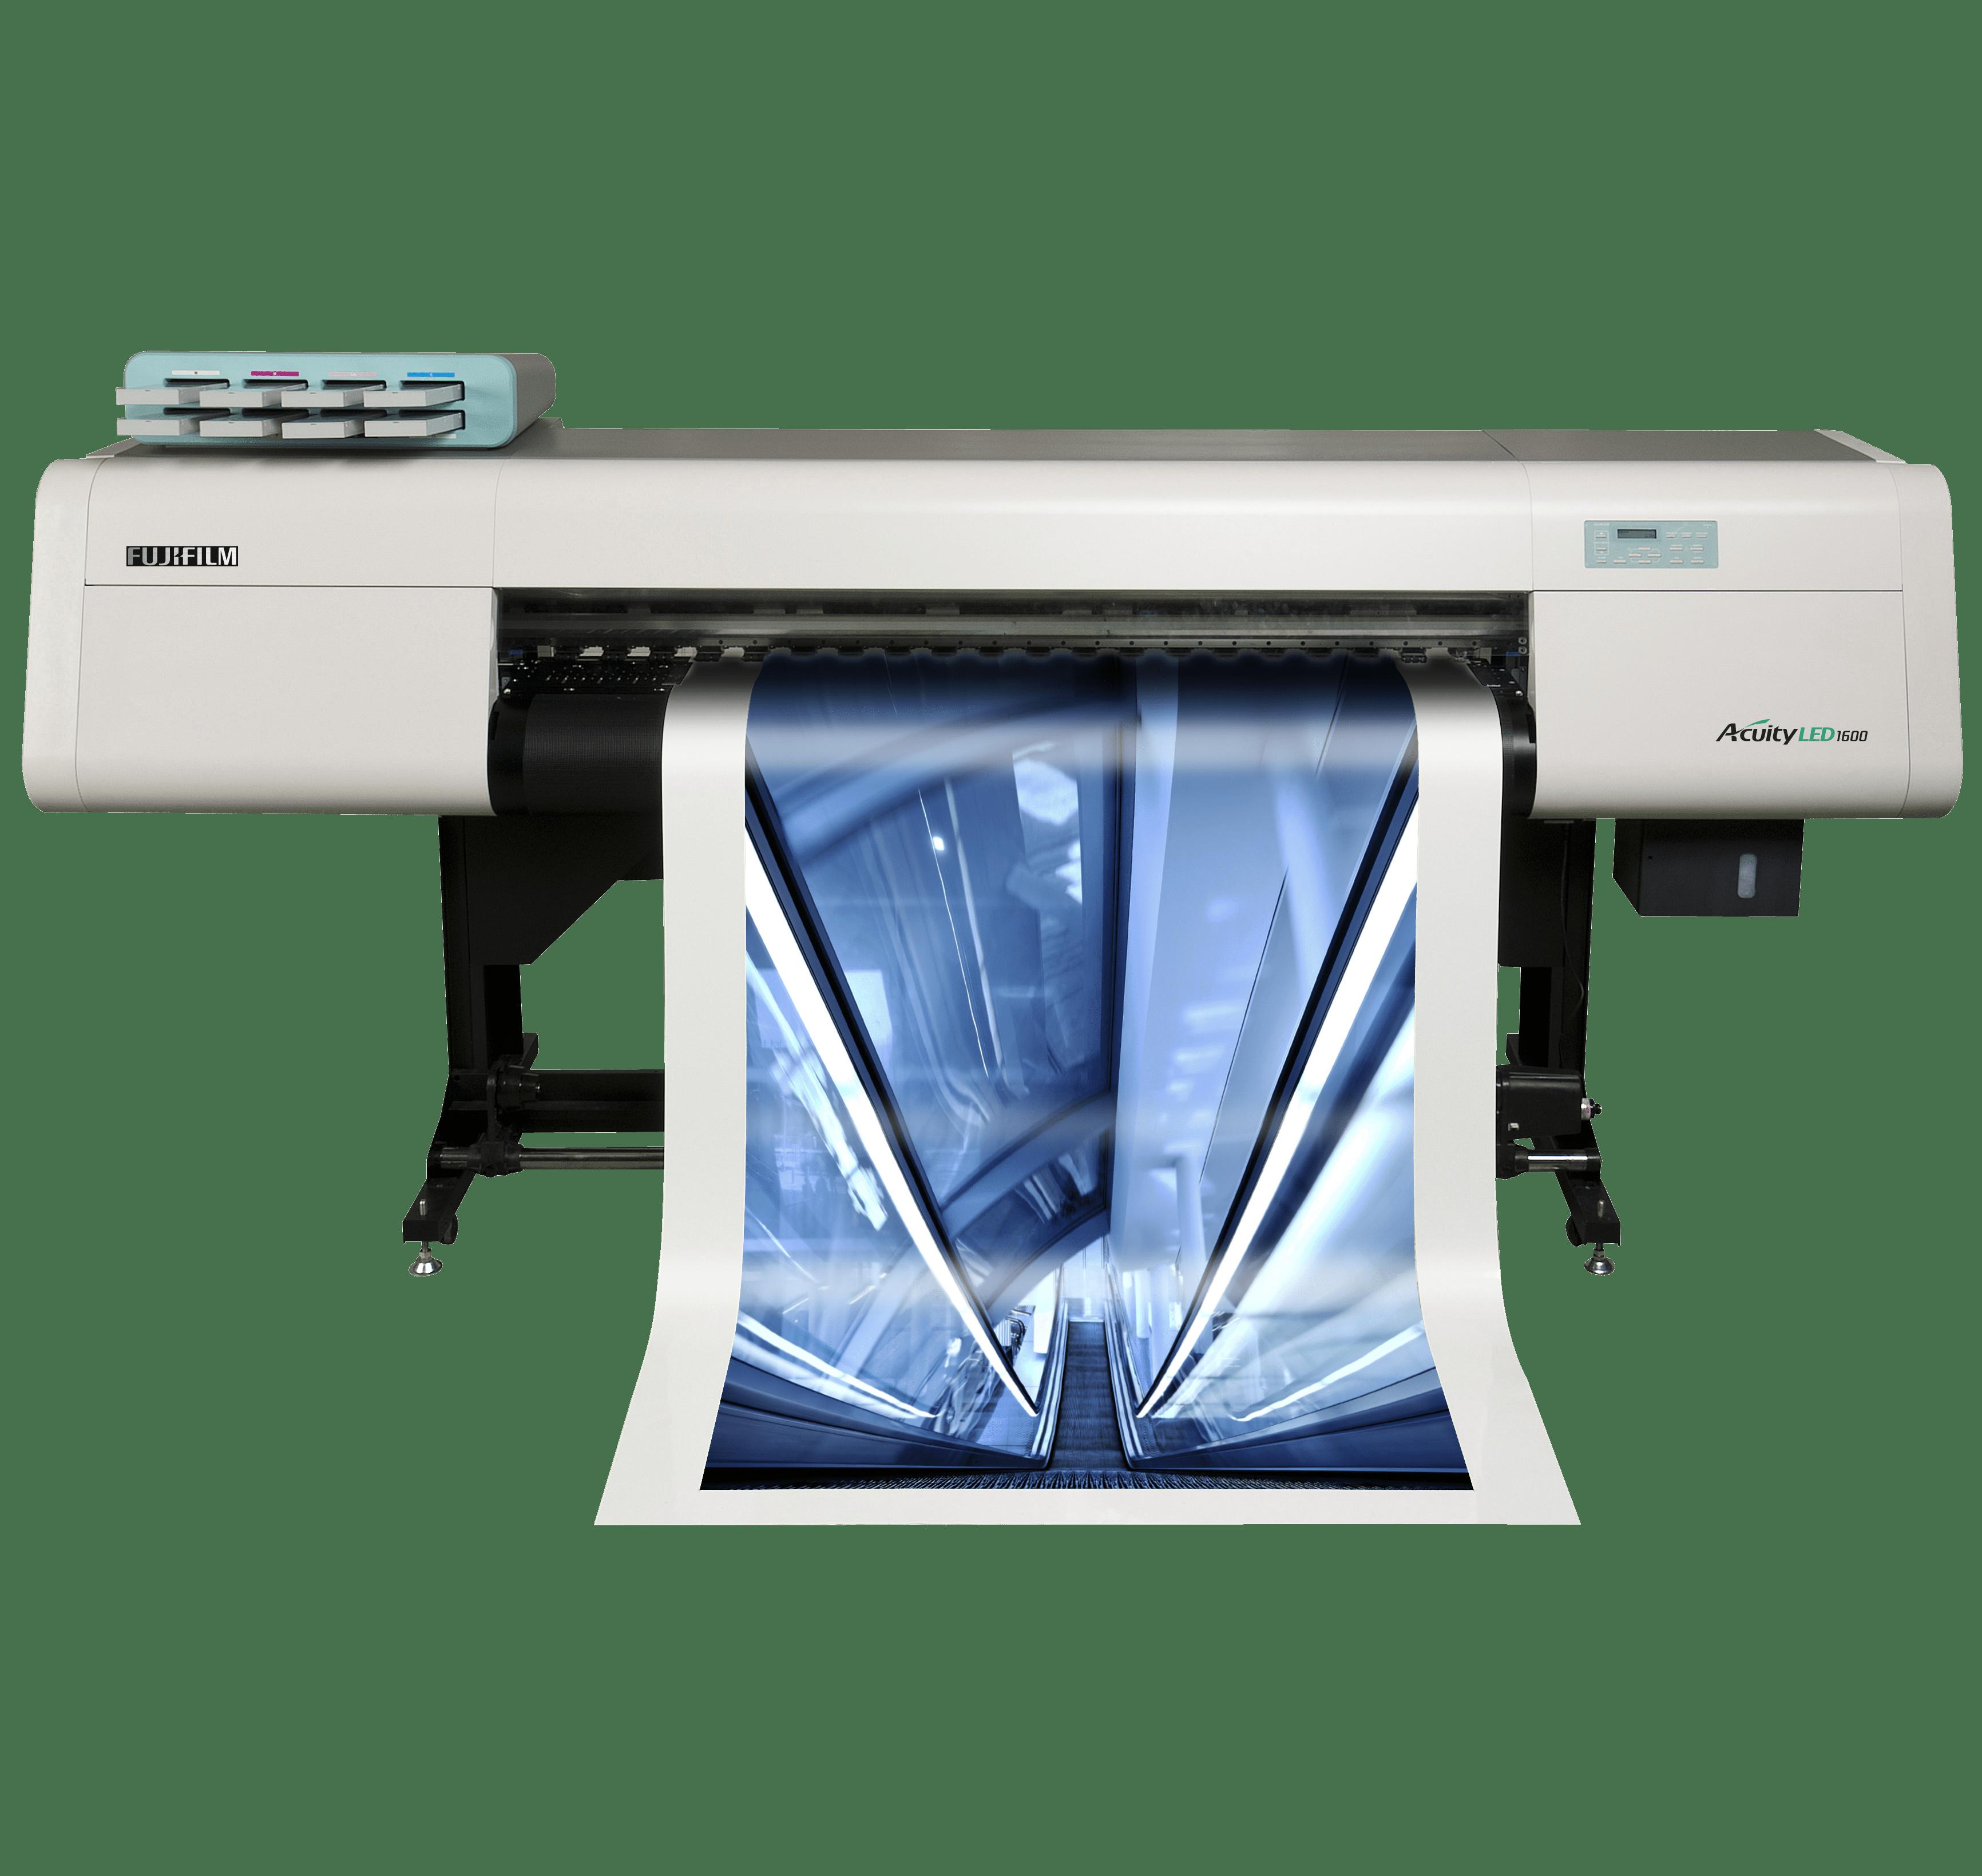 Fuji Acuity LED 1600 UV Inkjet Printer